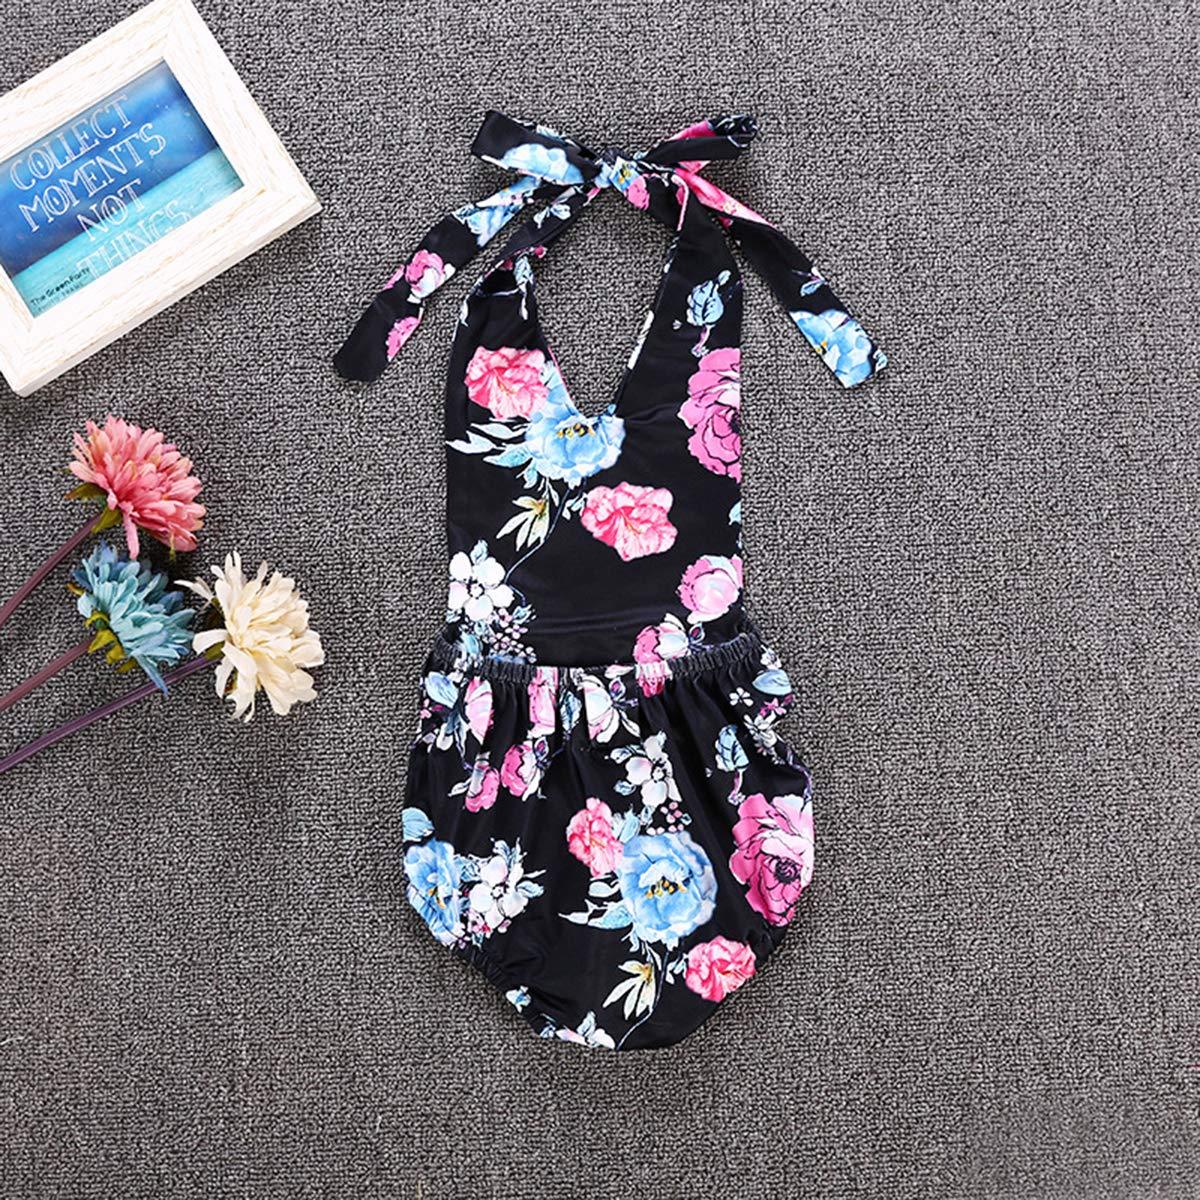 Newborn Baby Girl Summer Romper Sleeveless Clothes Flower Print Jumpsuit Bodysuit Outfit Set